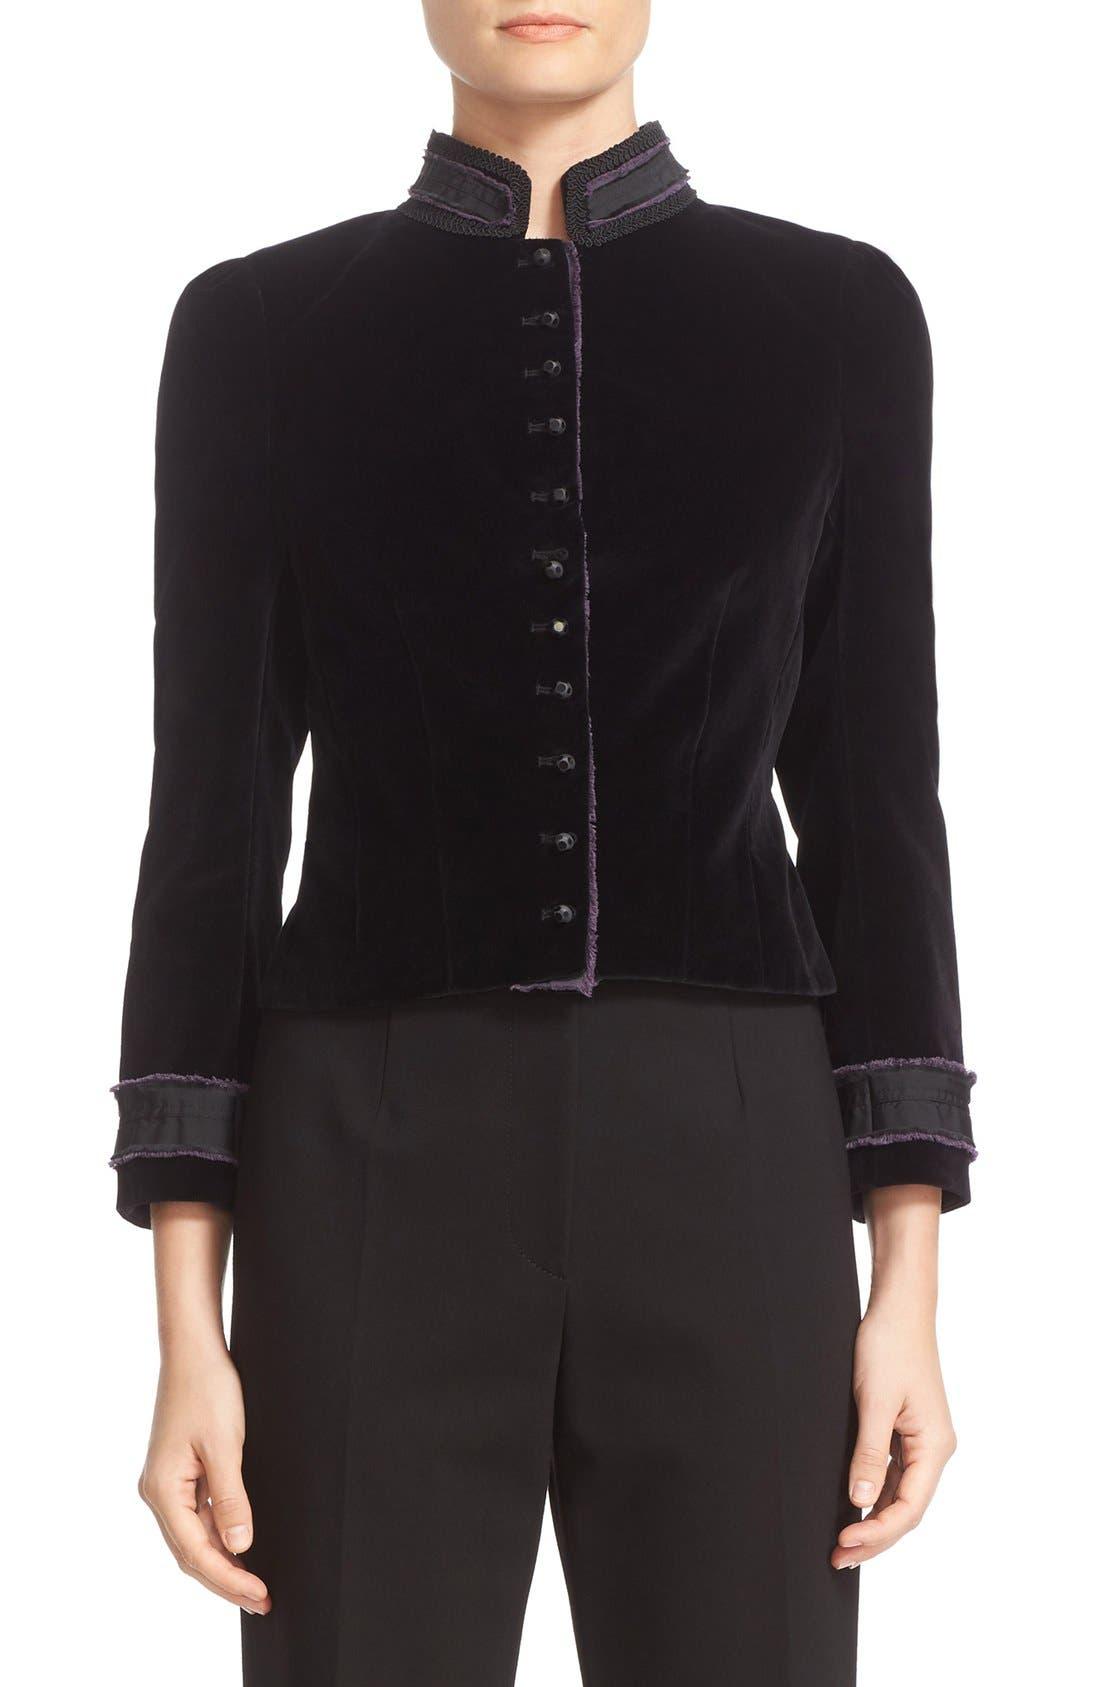 Alternate Image 1 Selected - MARC JACOBS Cotton Velvet Victorian Jacket